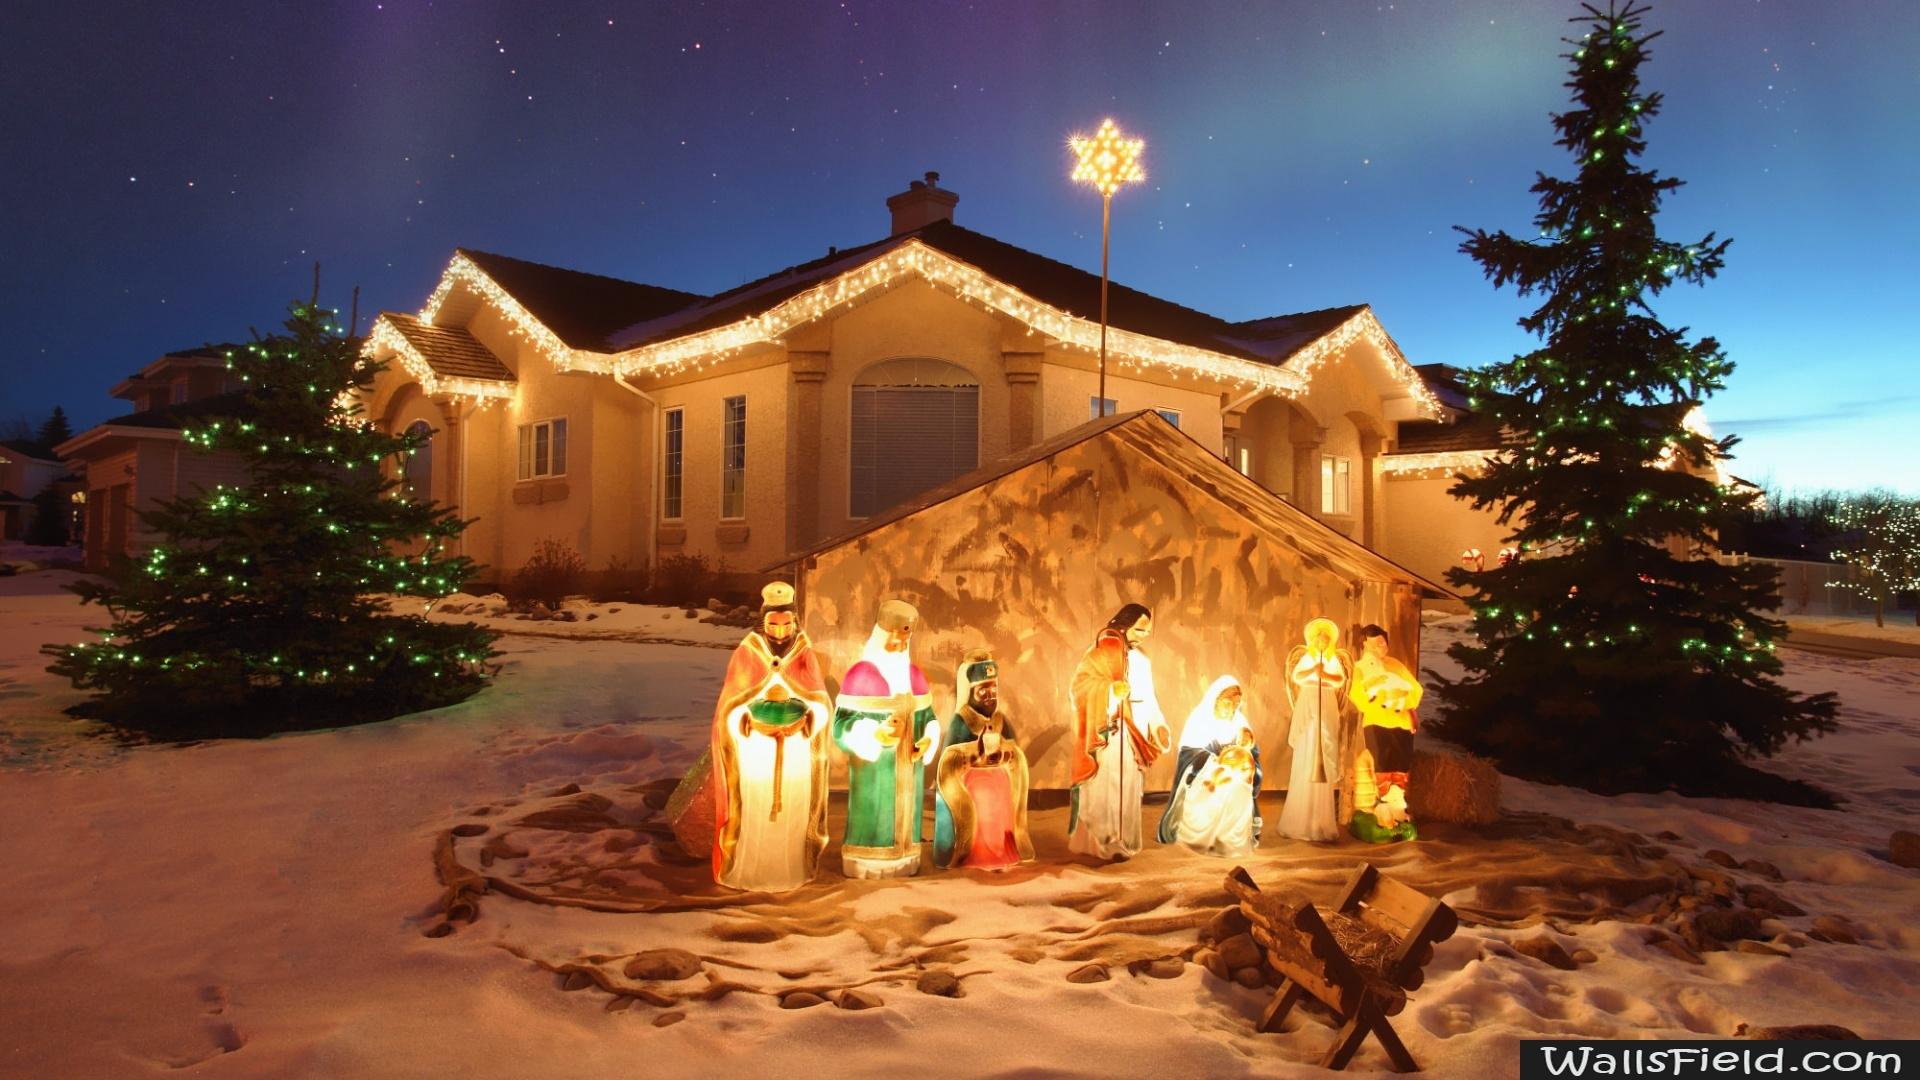 Outdoor Christmas Nativity Scene Wallsfield.com Free HD